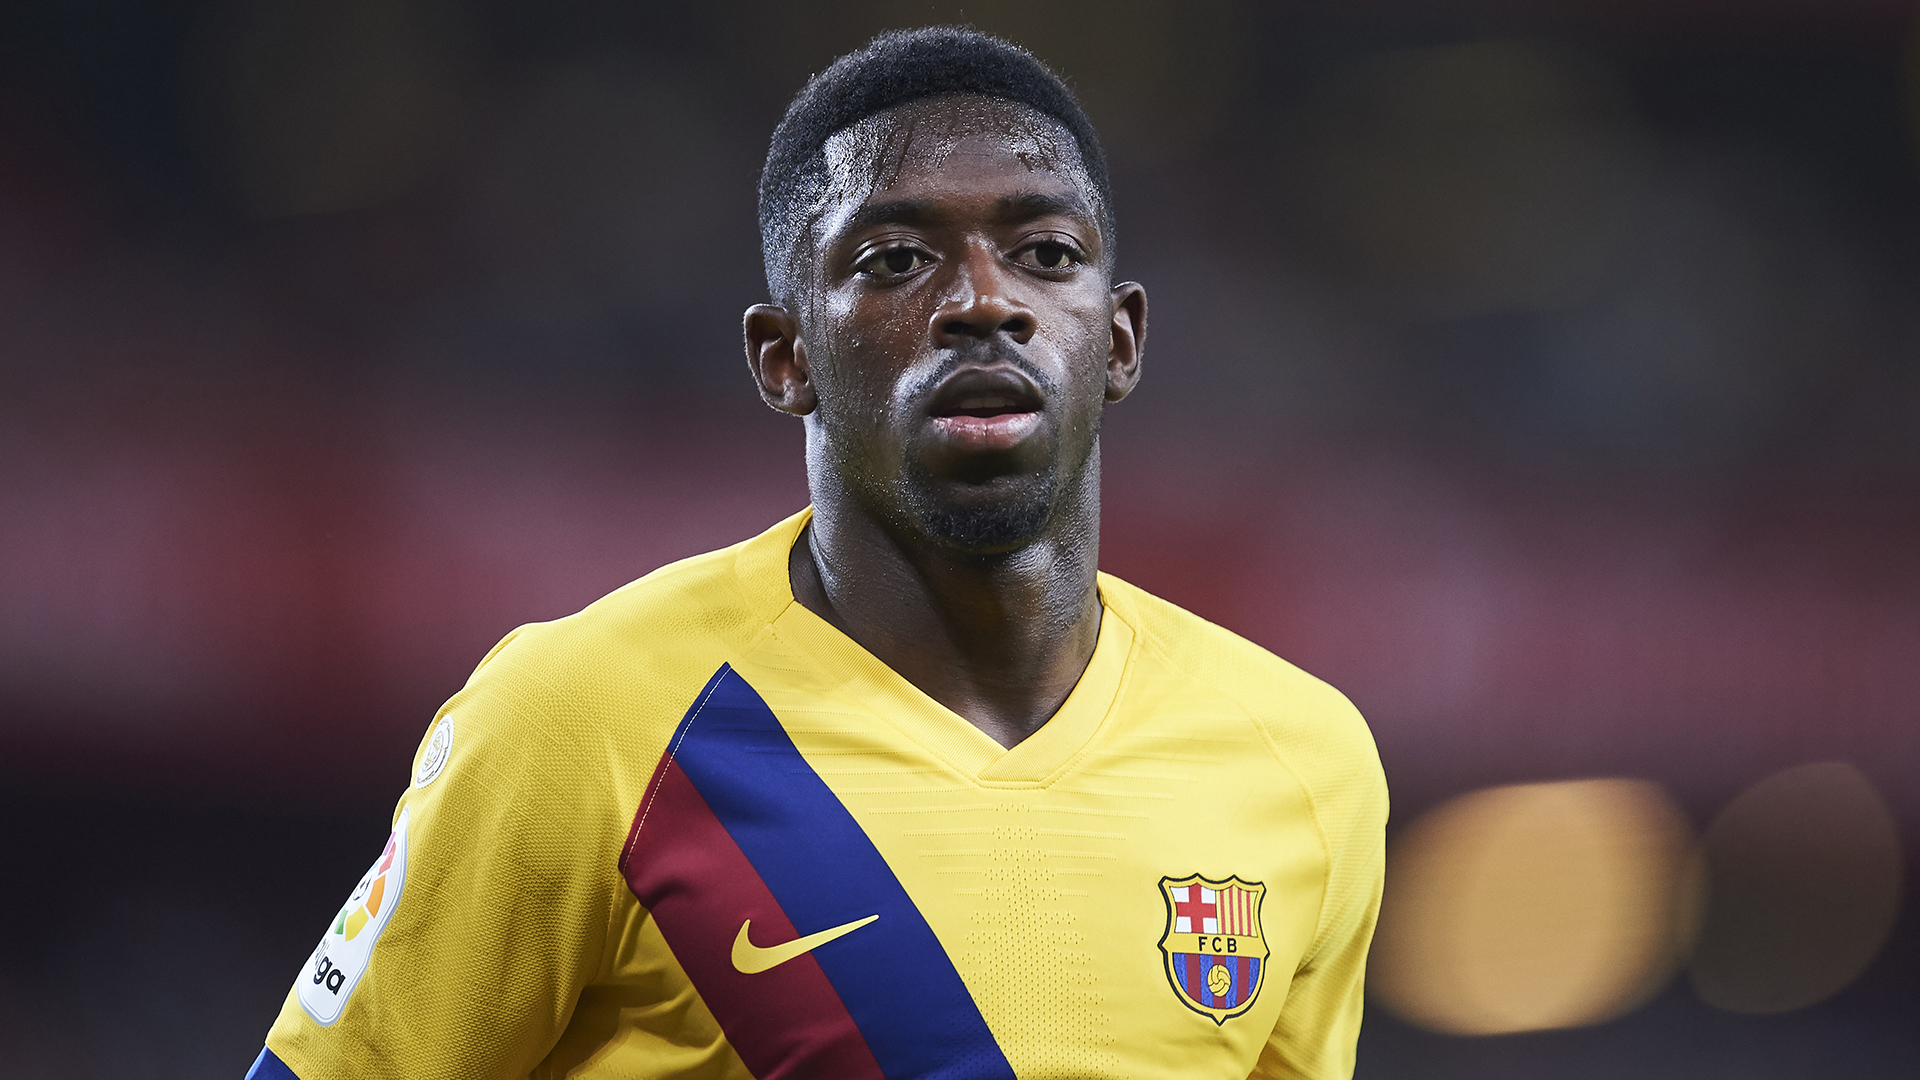 Ousmane Dembele On Manchester United Radar